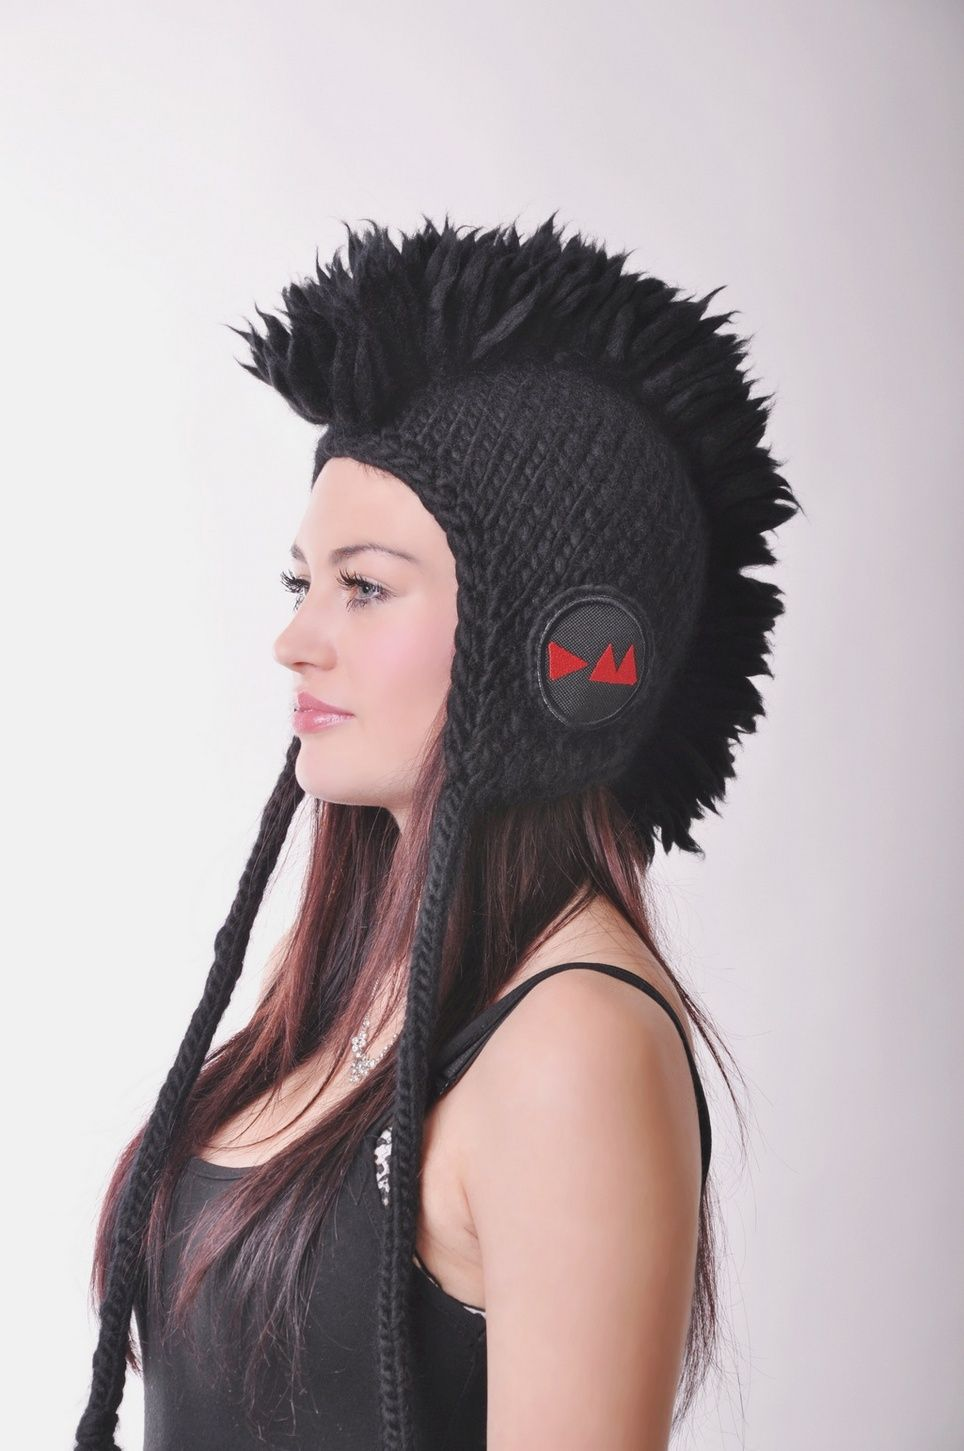 34d5a789dcf Mohawk hat. Mohawk hat Depeche Mode ...